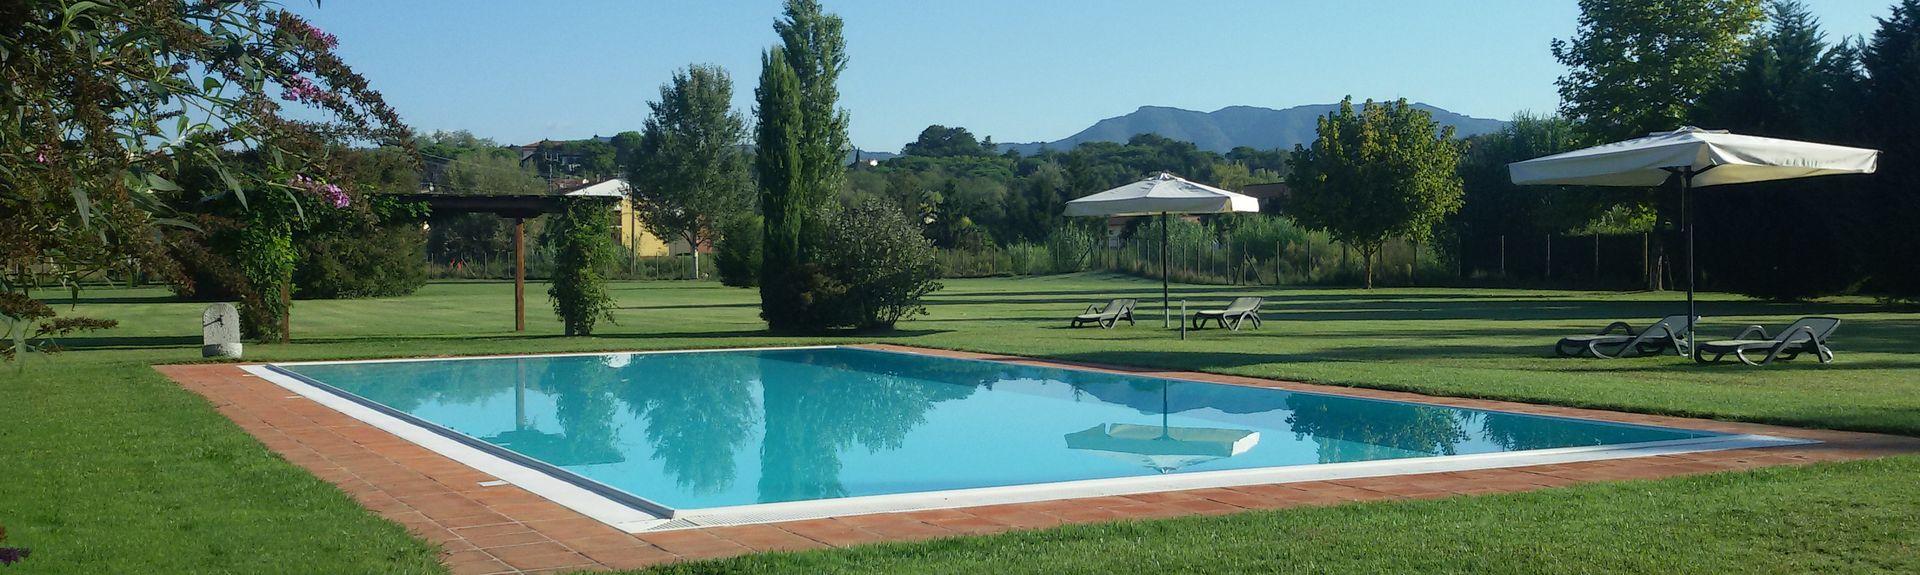 Versilia, Toscana, Italia